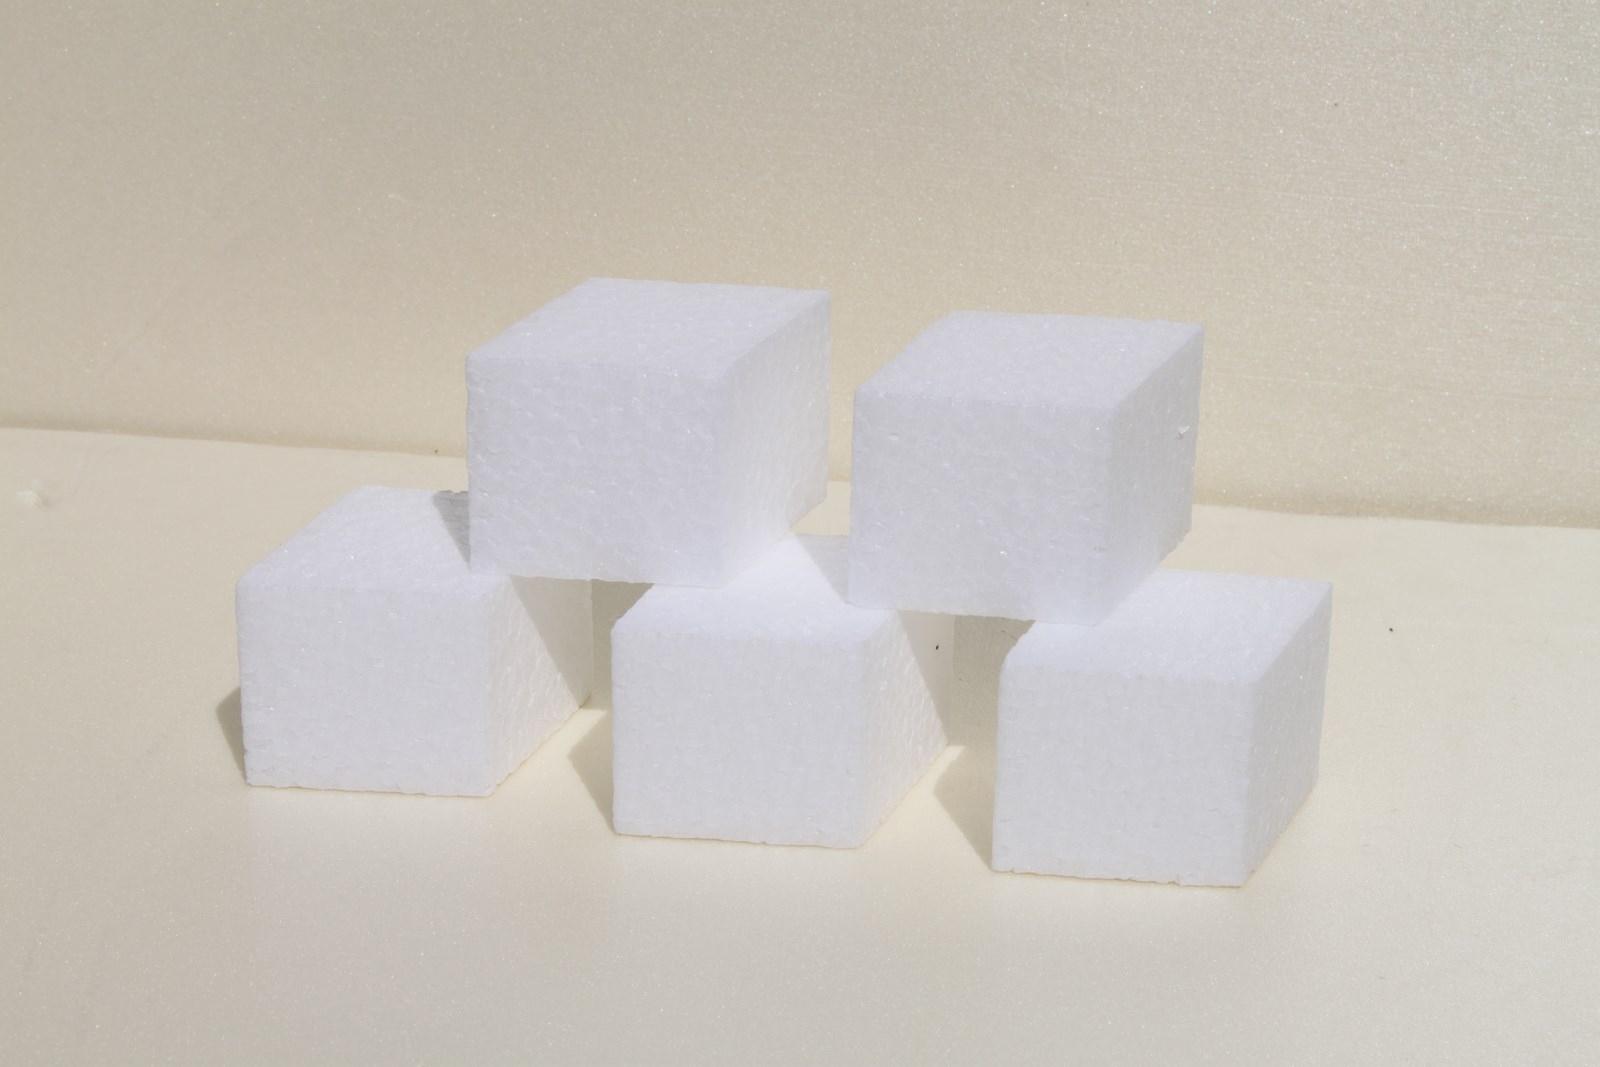 Mini diamond cake dummies